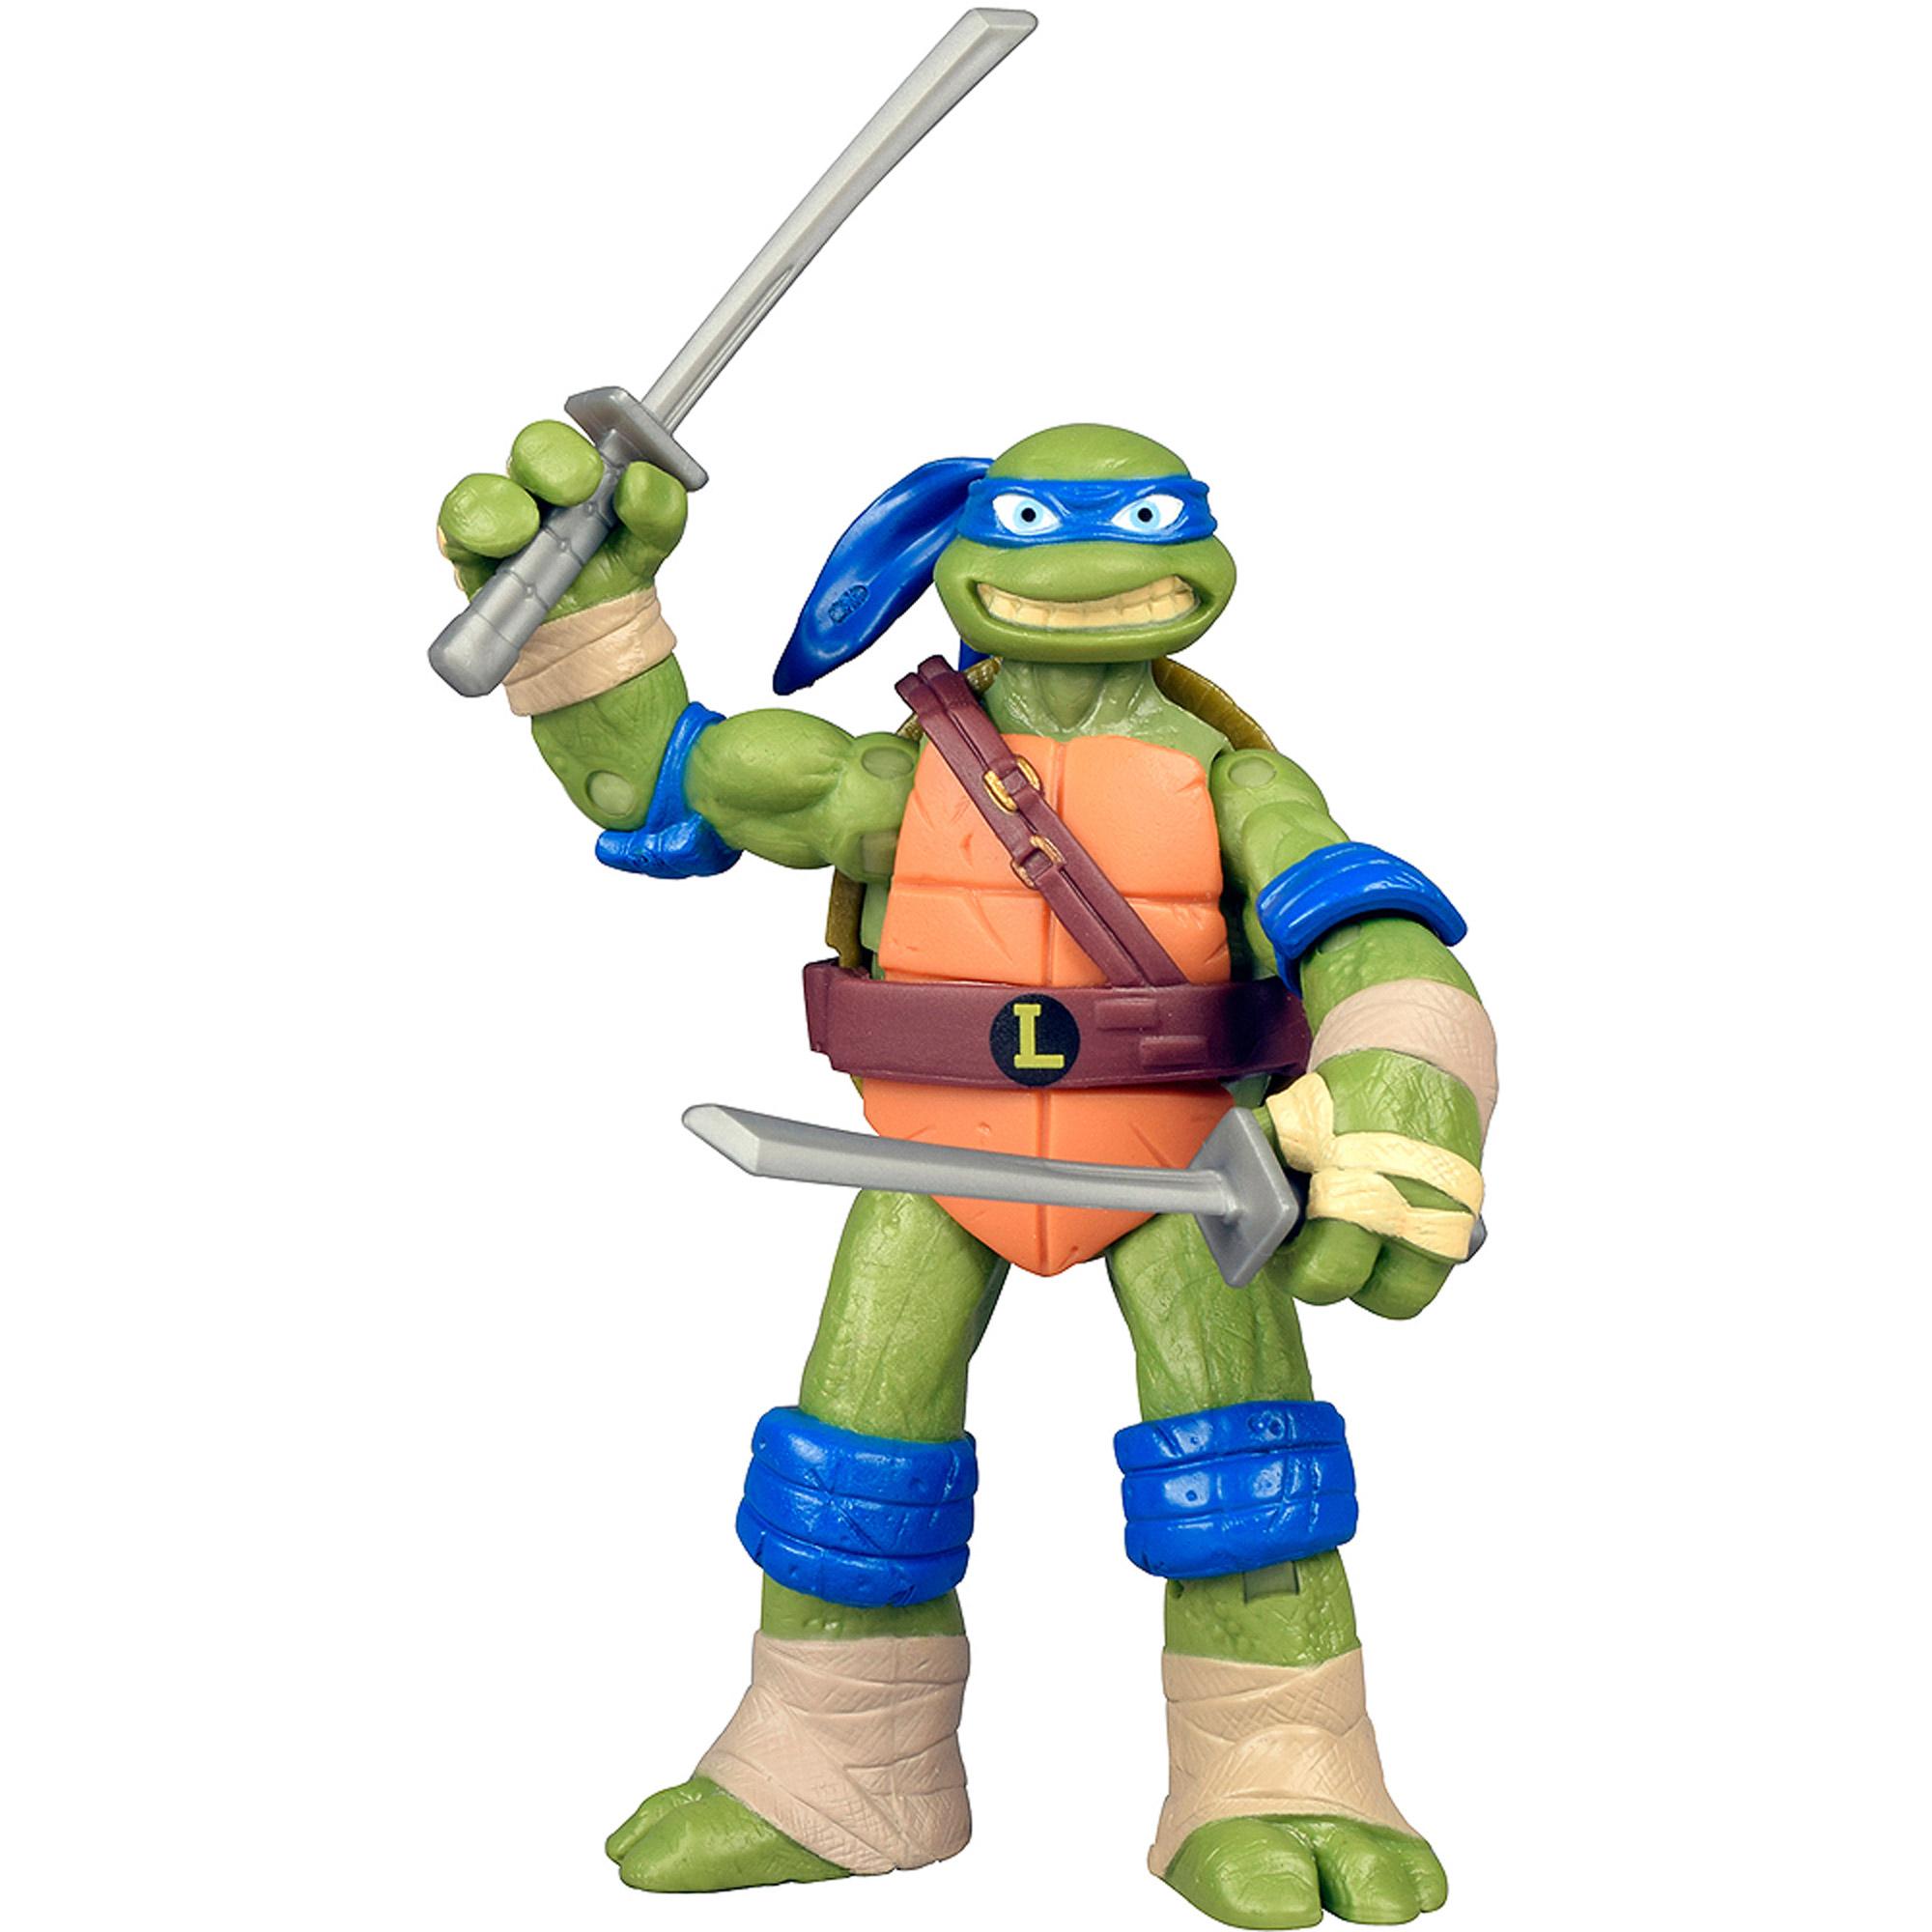 Walmart Credit Card Review >> Nickelodeon Teenage Mutant Ninja Turtles Re-Deco Action Figure, Leonardo - Walmart.com